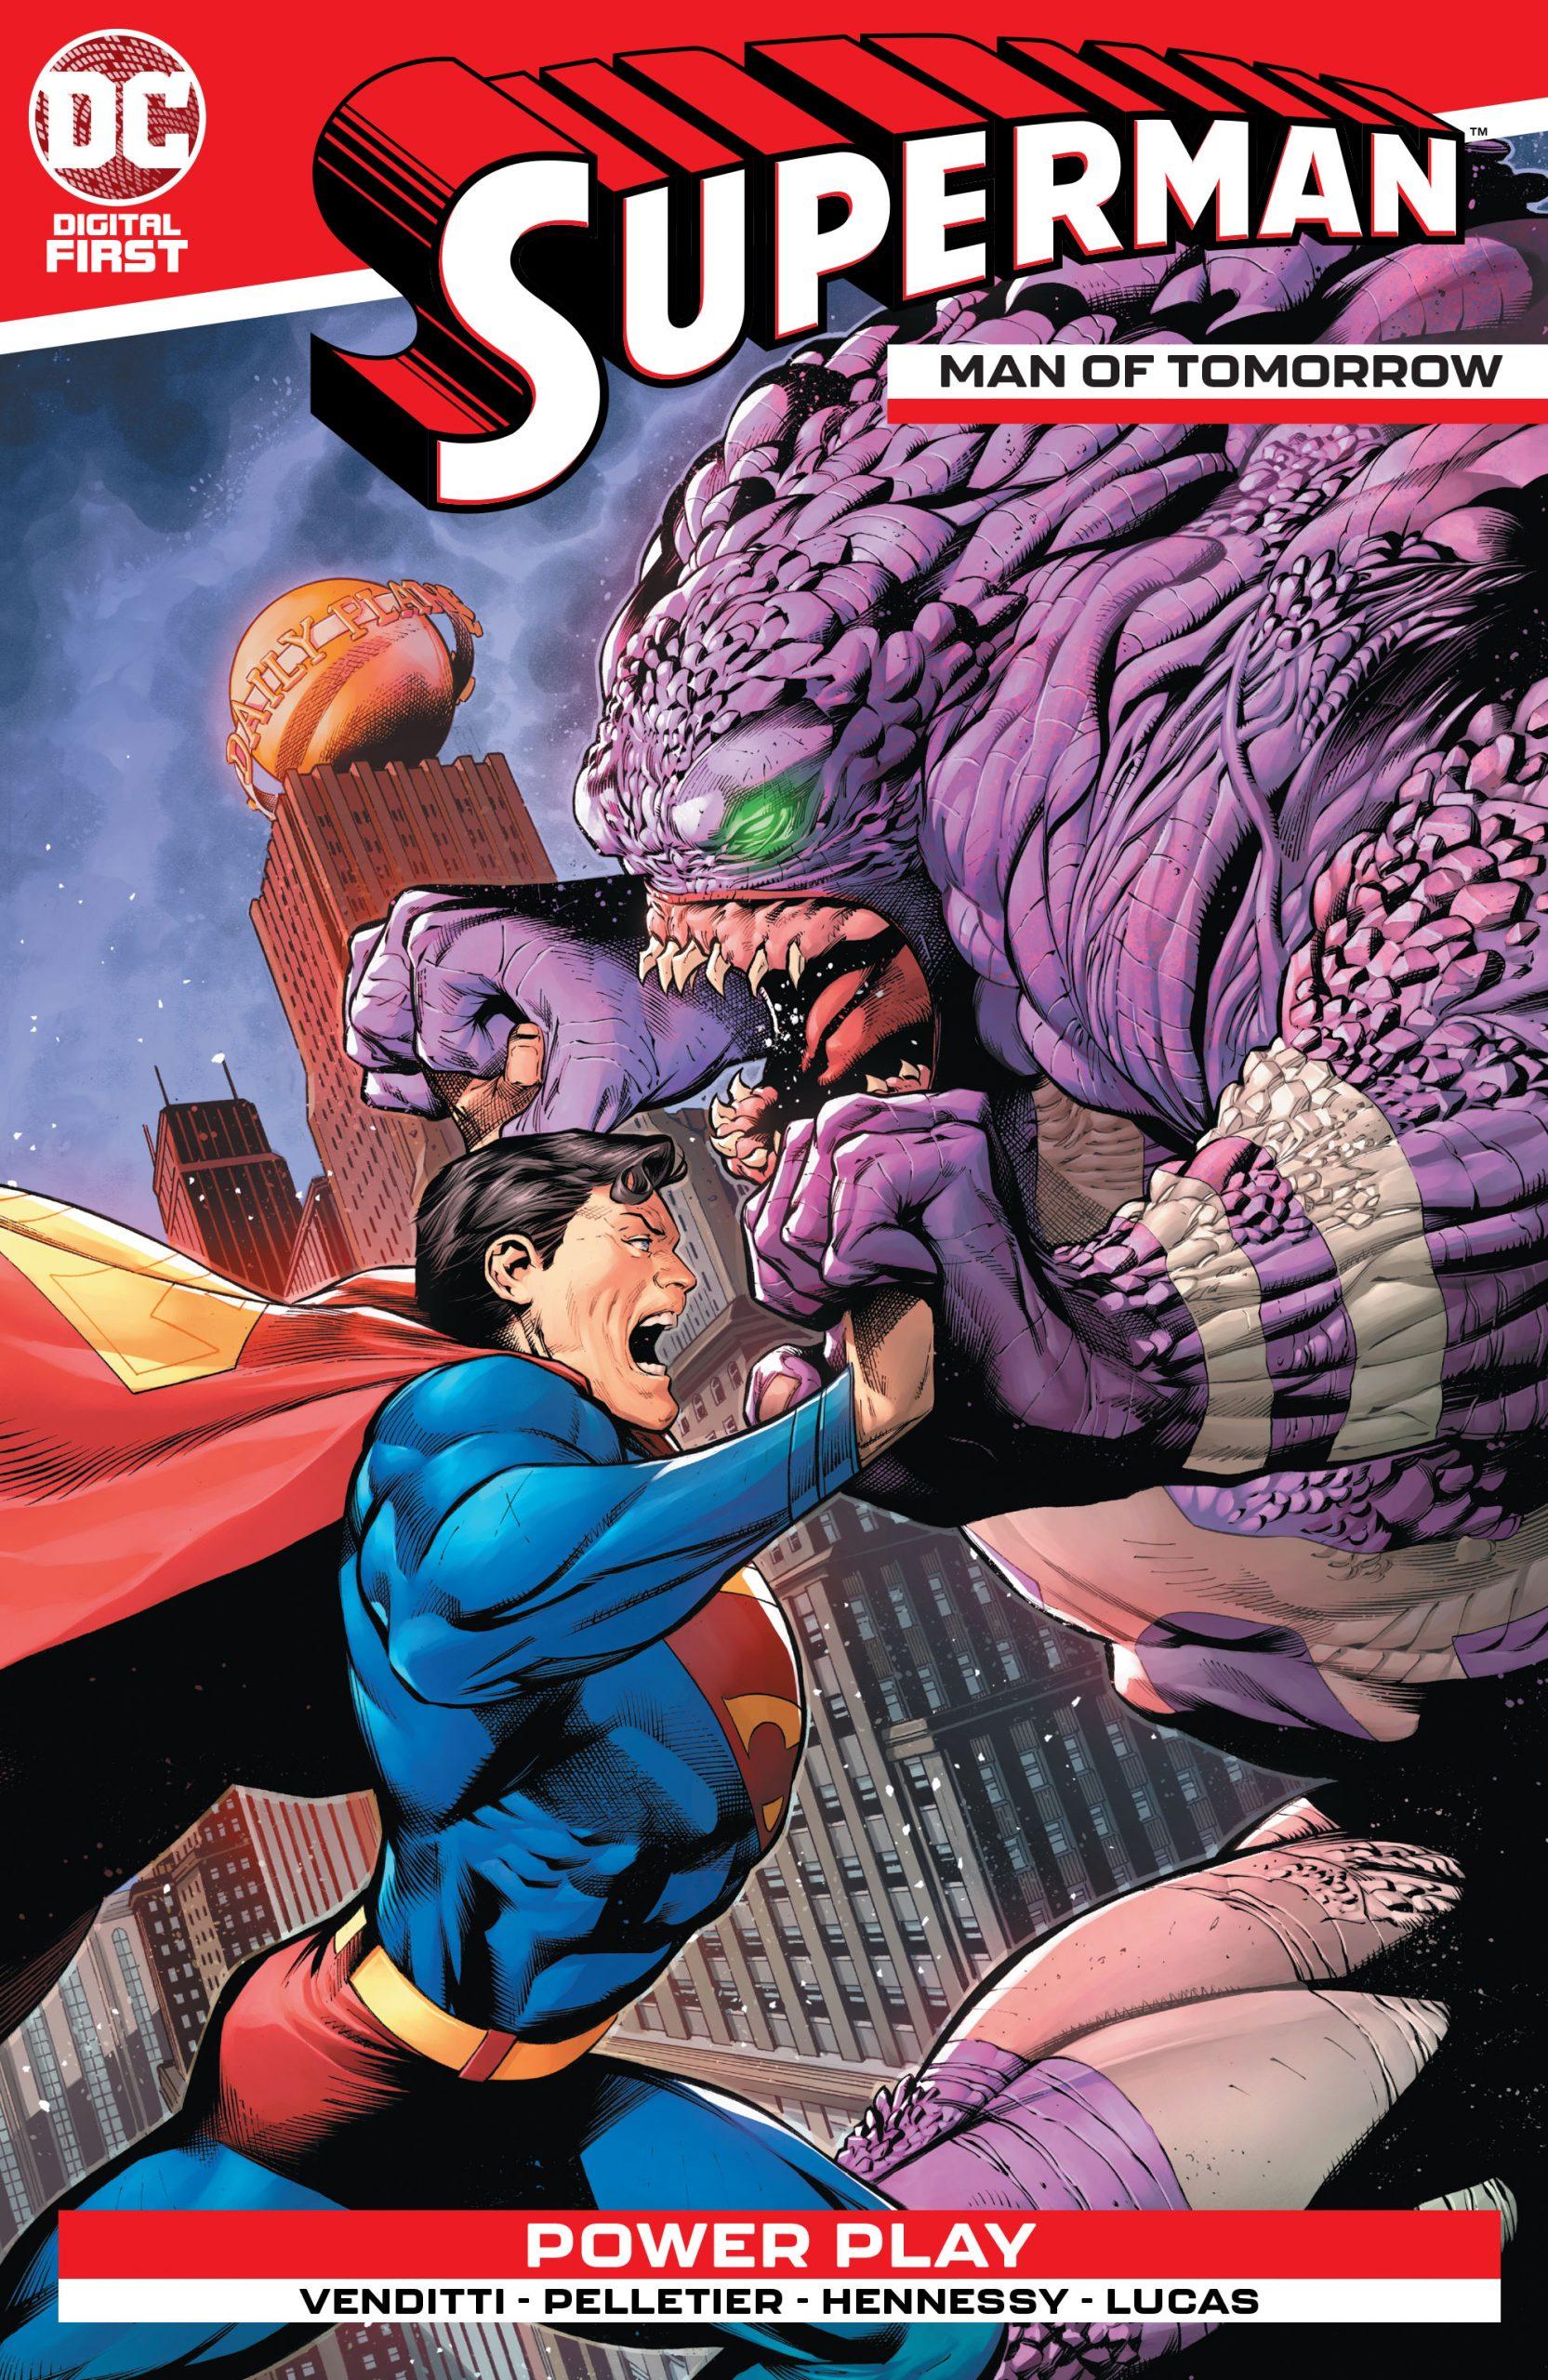 SUPERMAN: THE MAN OF TOMORROW #1